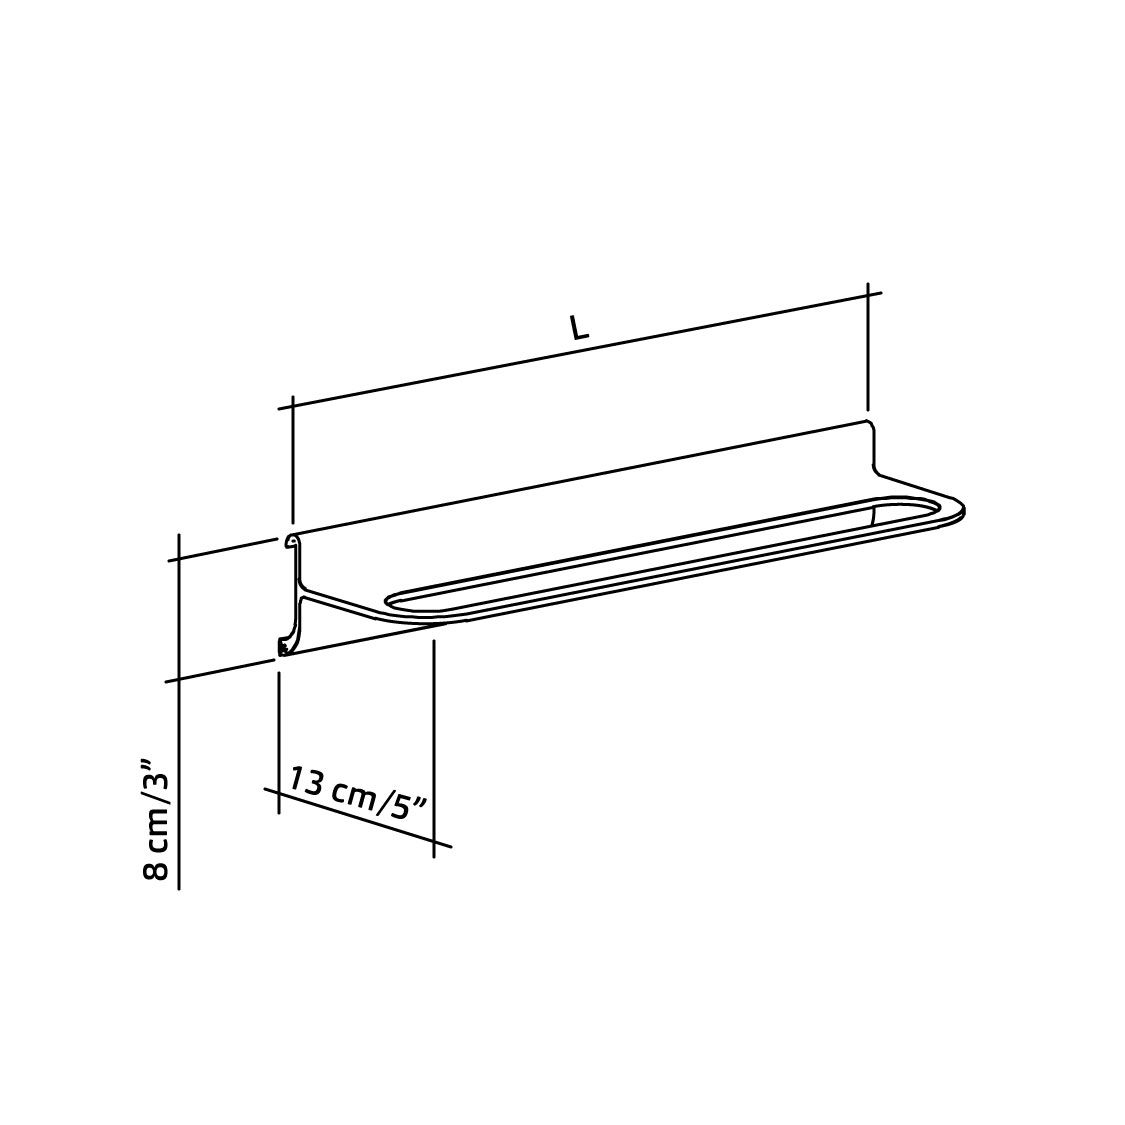 51-421-xx-towel-holders-for-horizontal-track-diagram